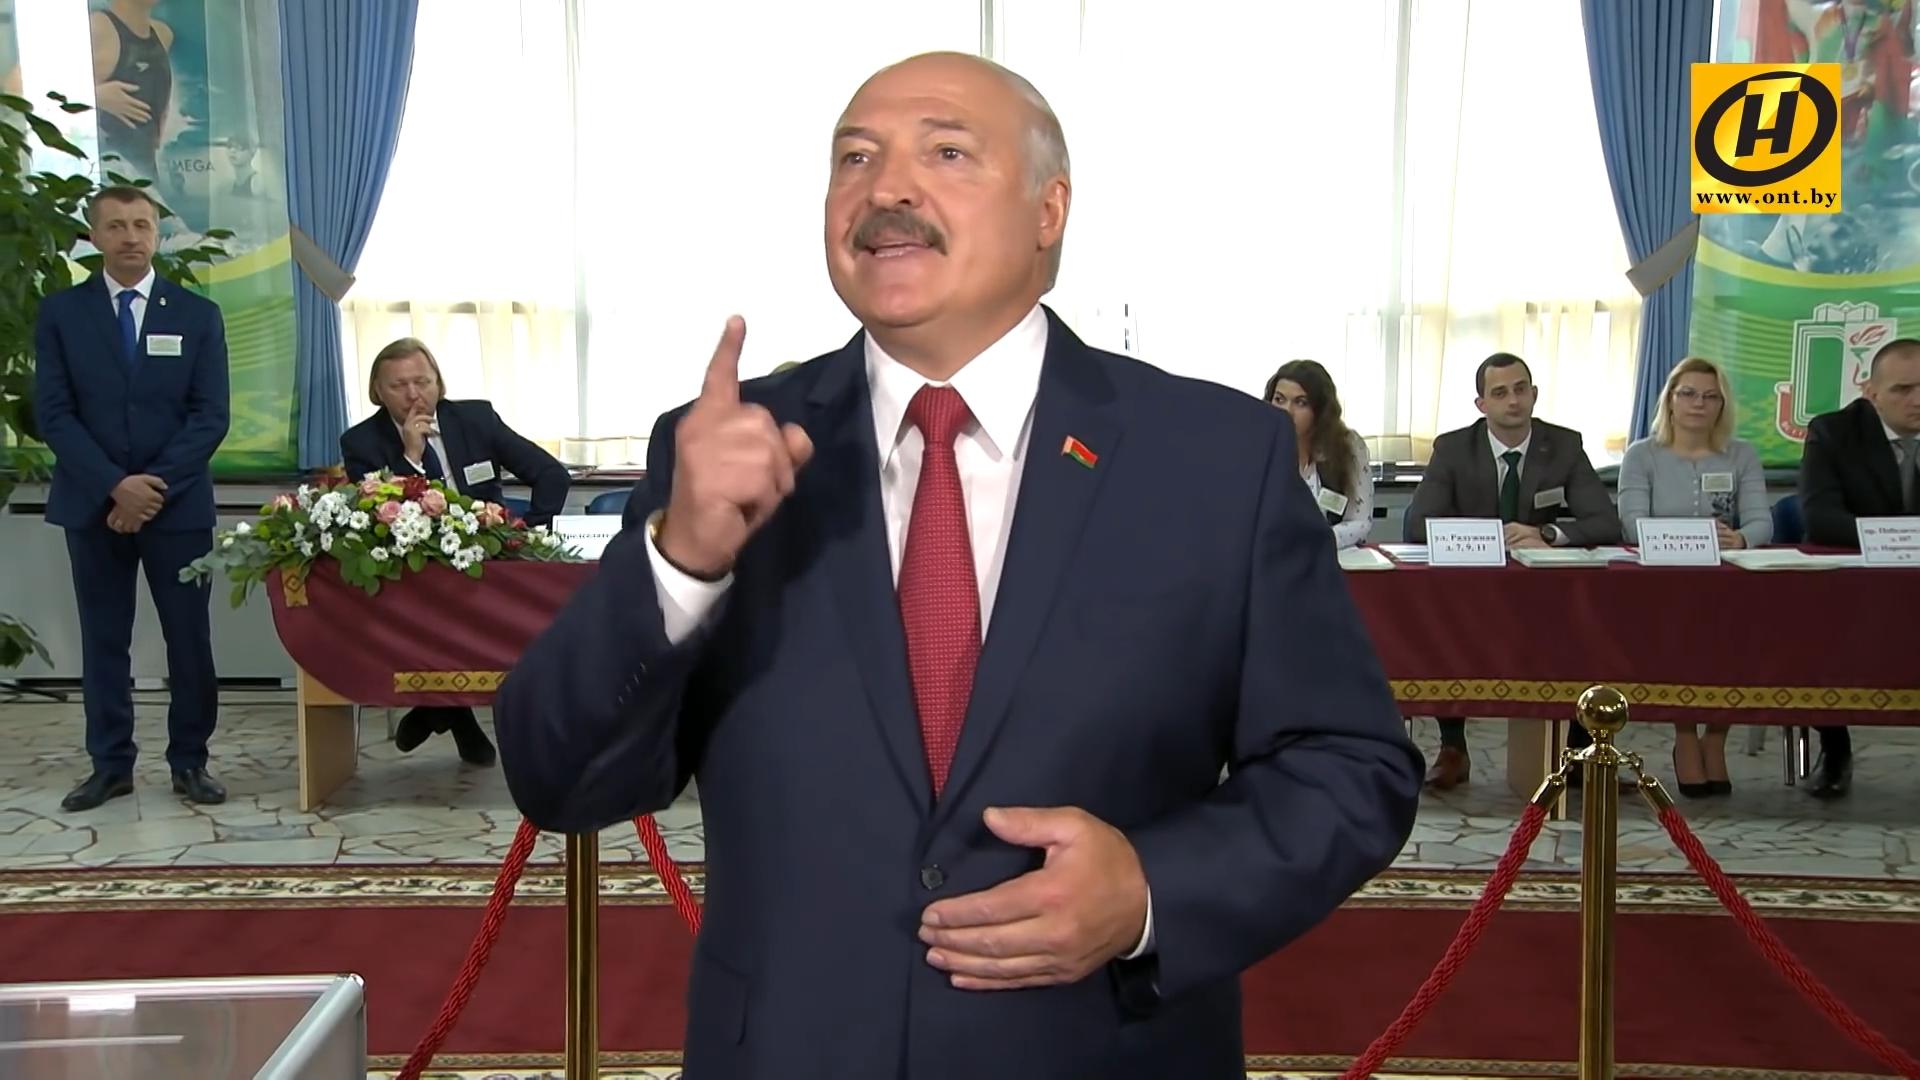 20191117-Лукашенко- не подпишу ни один документ с Россией, противоречащий Конституции!-pic2